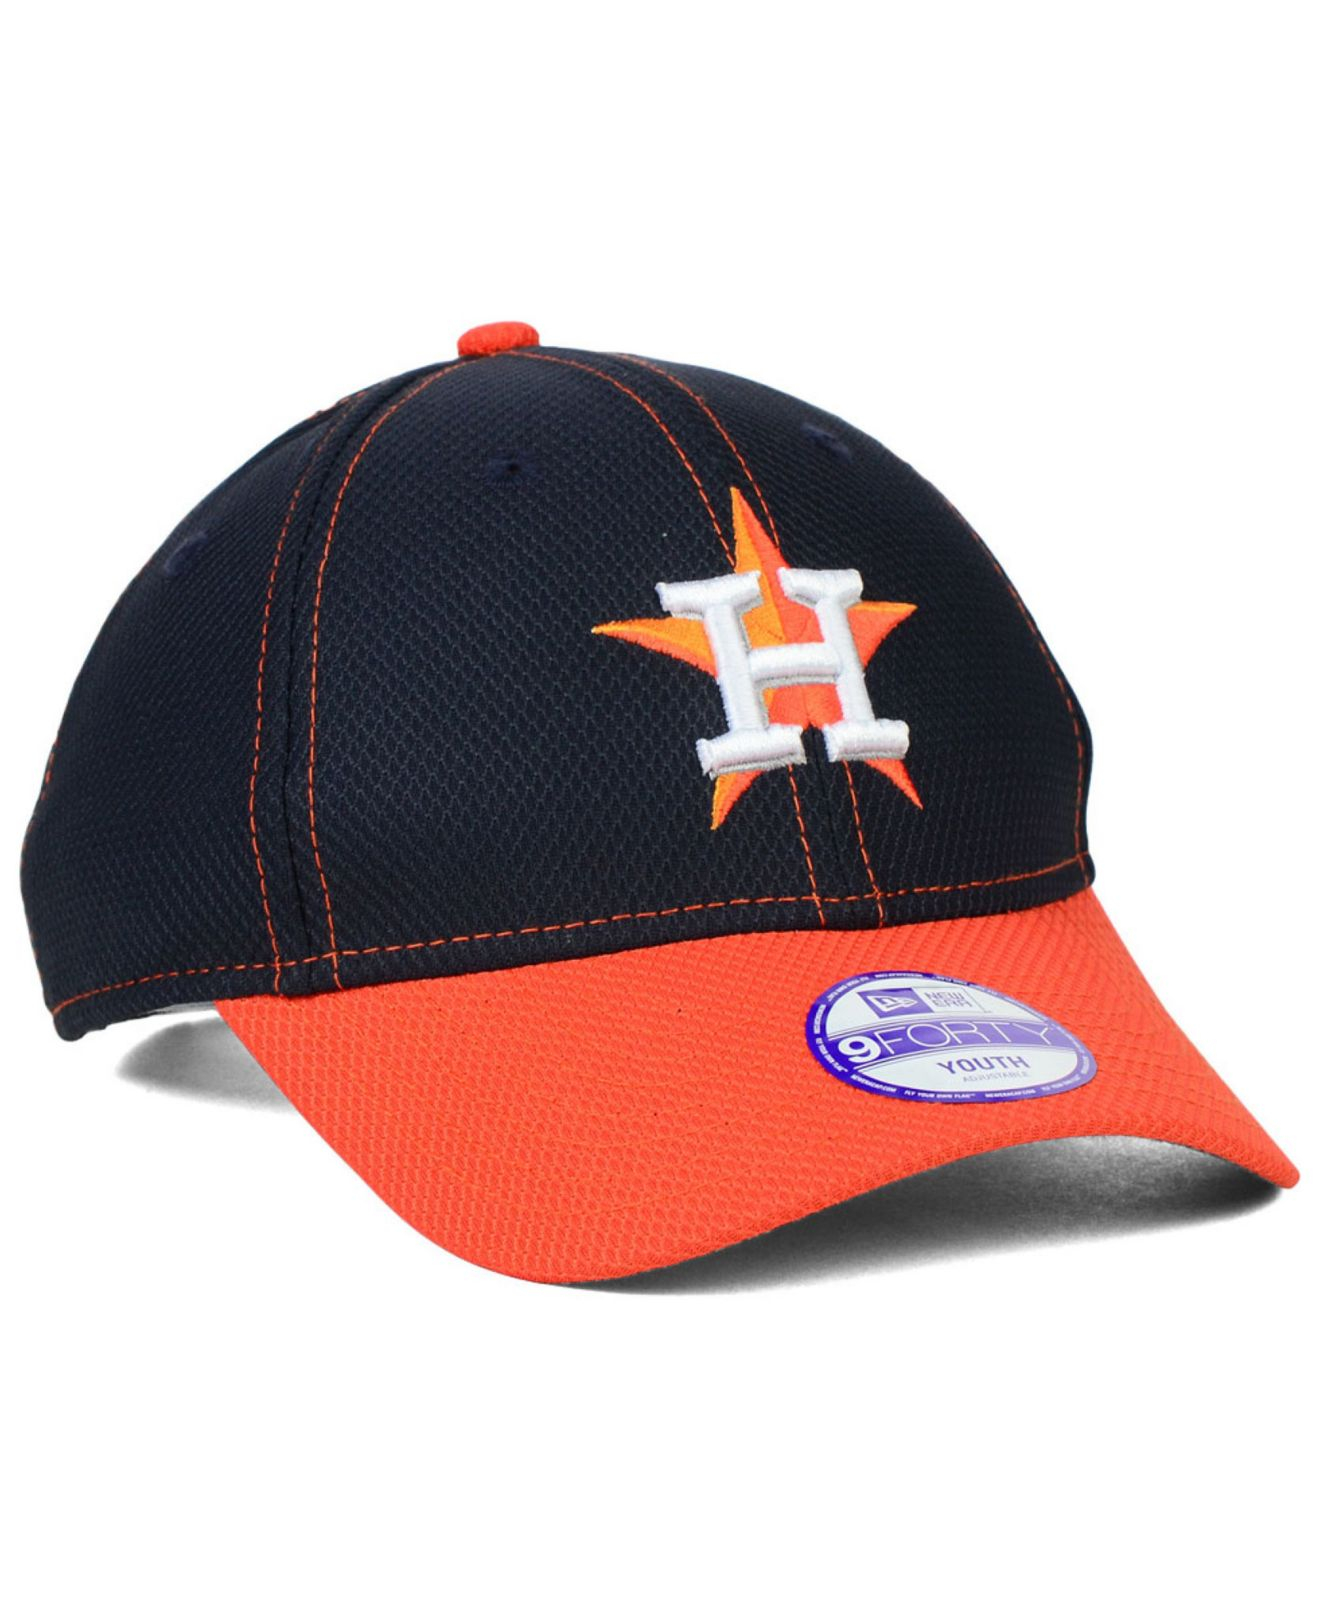 08649aa7c86 ... inexpensive lyst ktz kids houston astros 9forty cap in blue 14c88 7f008